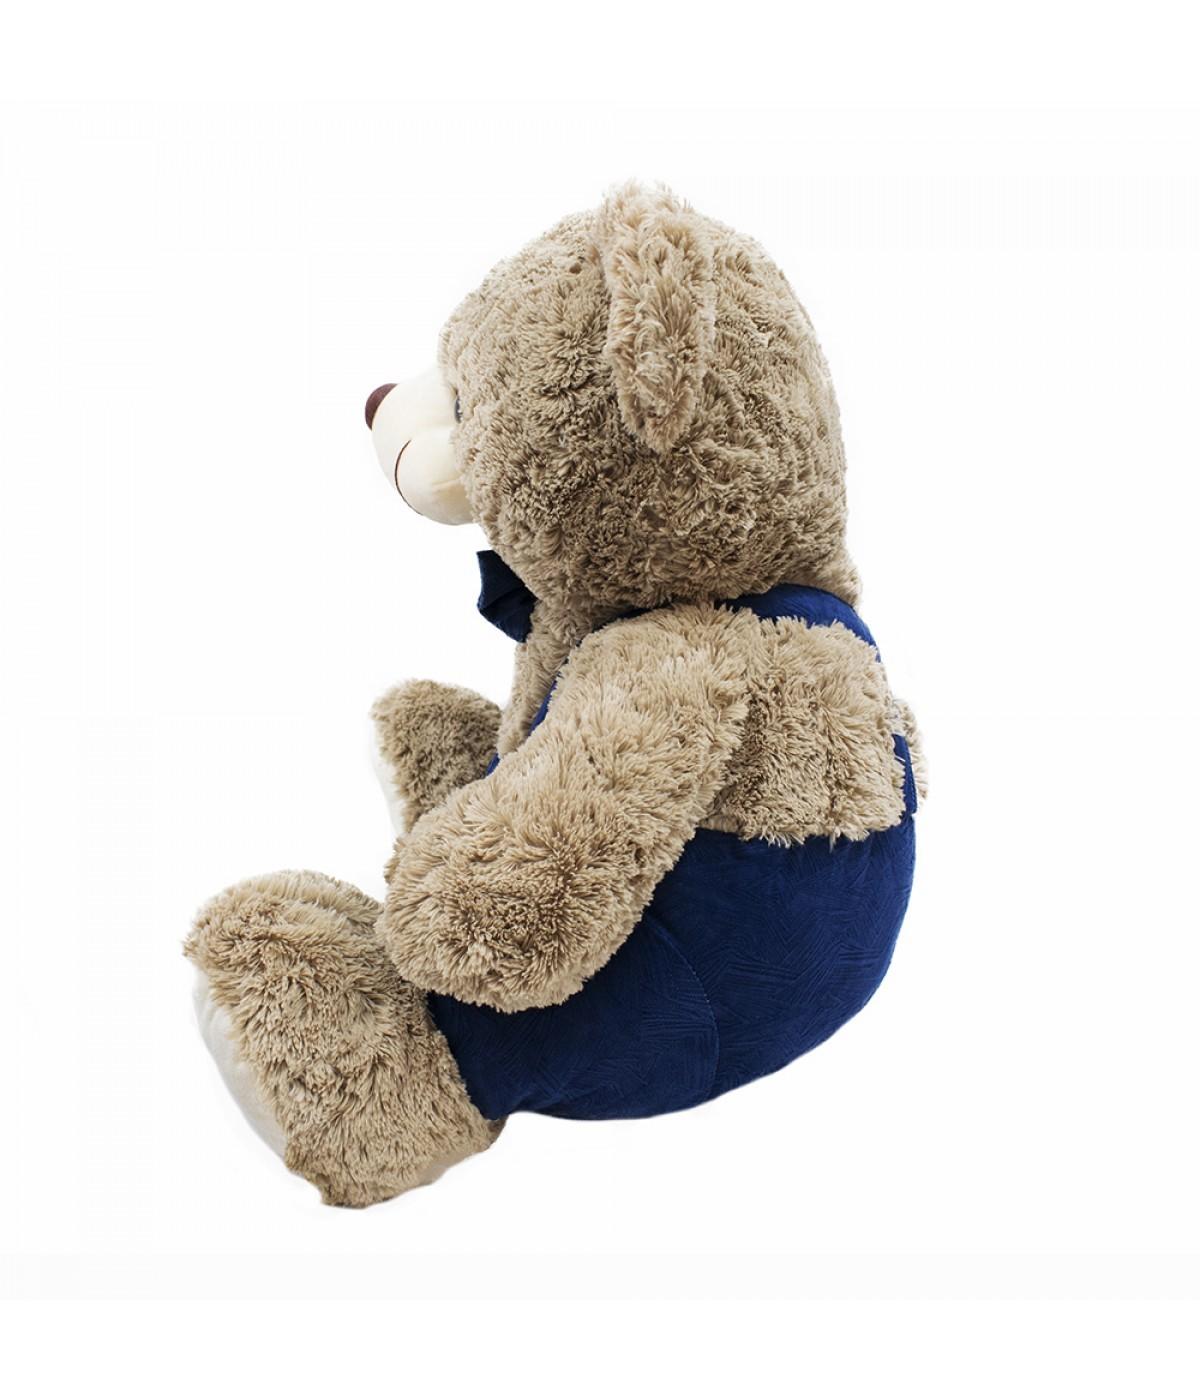 Pelúcia Urso Gravata e Suspensório (Grande) - 50cm